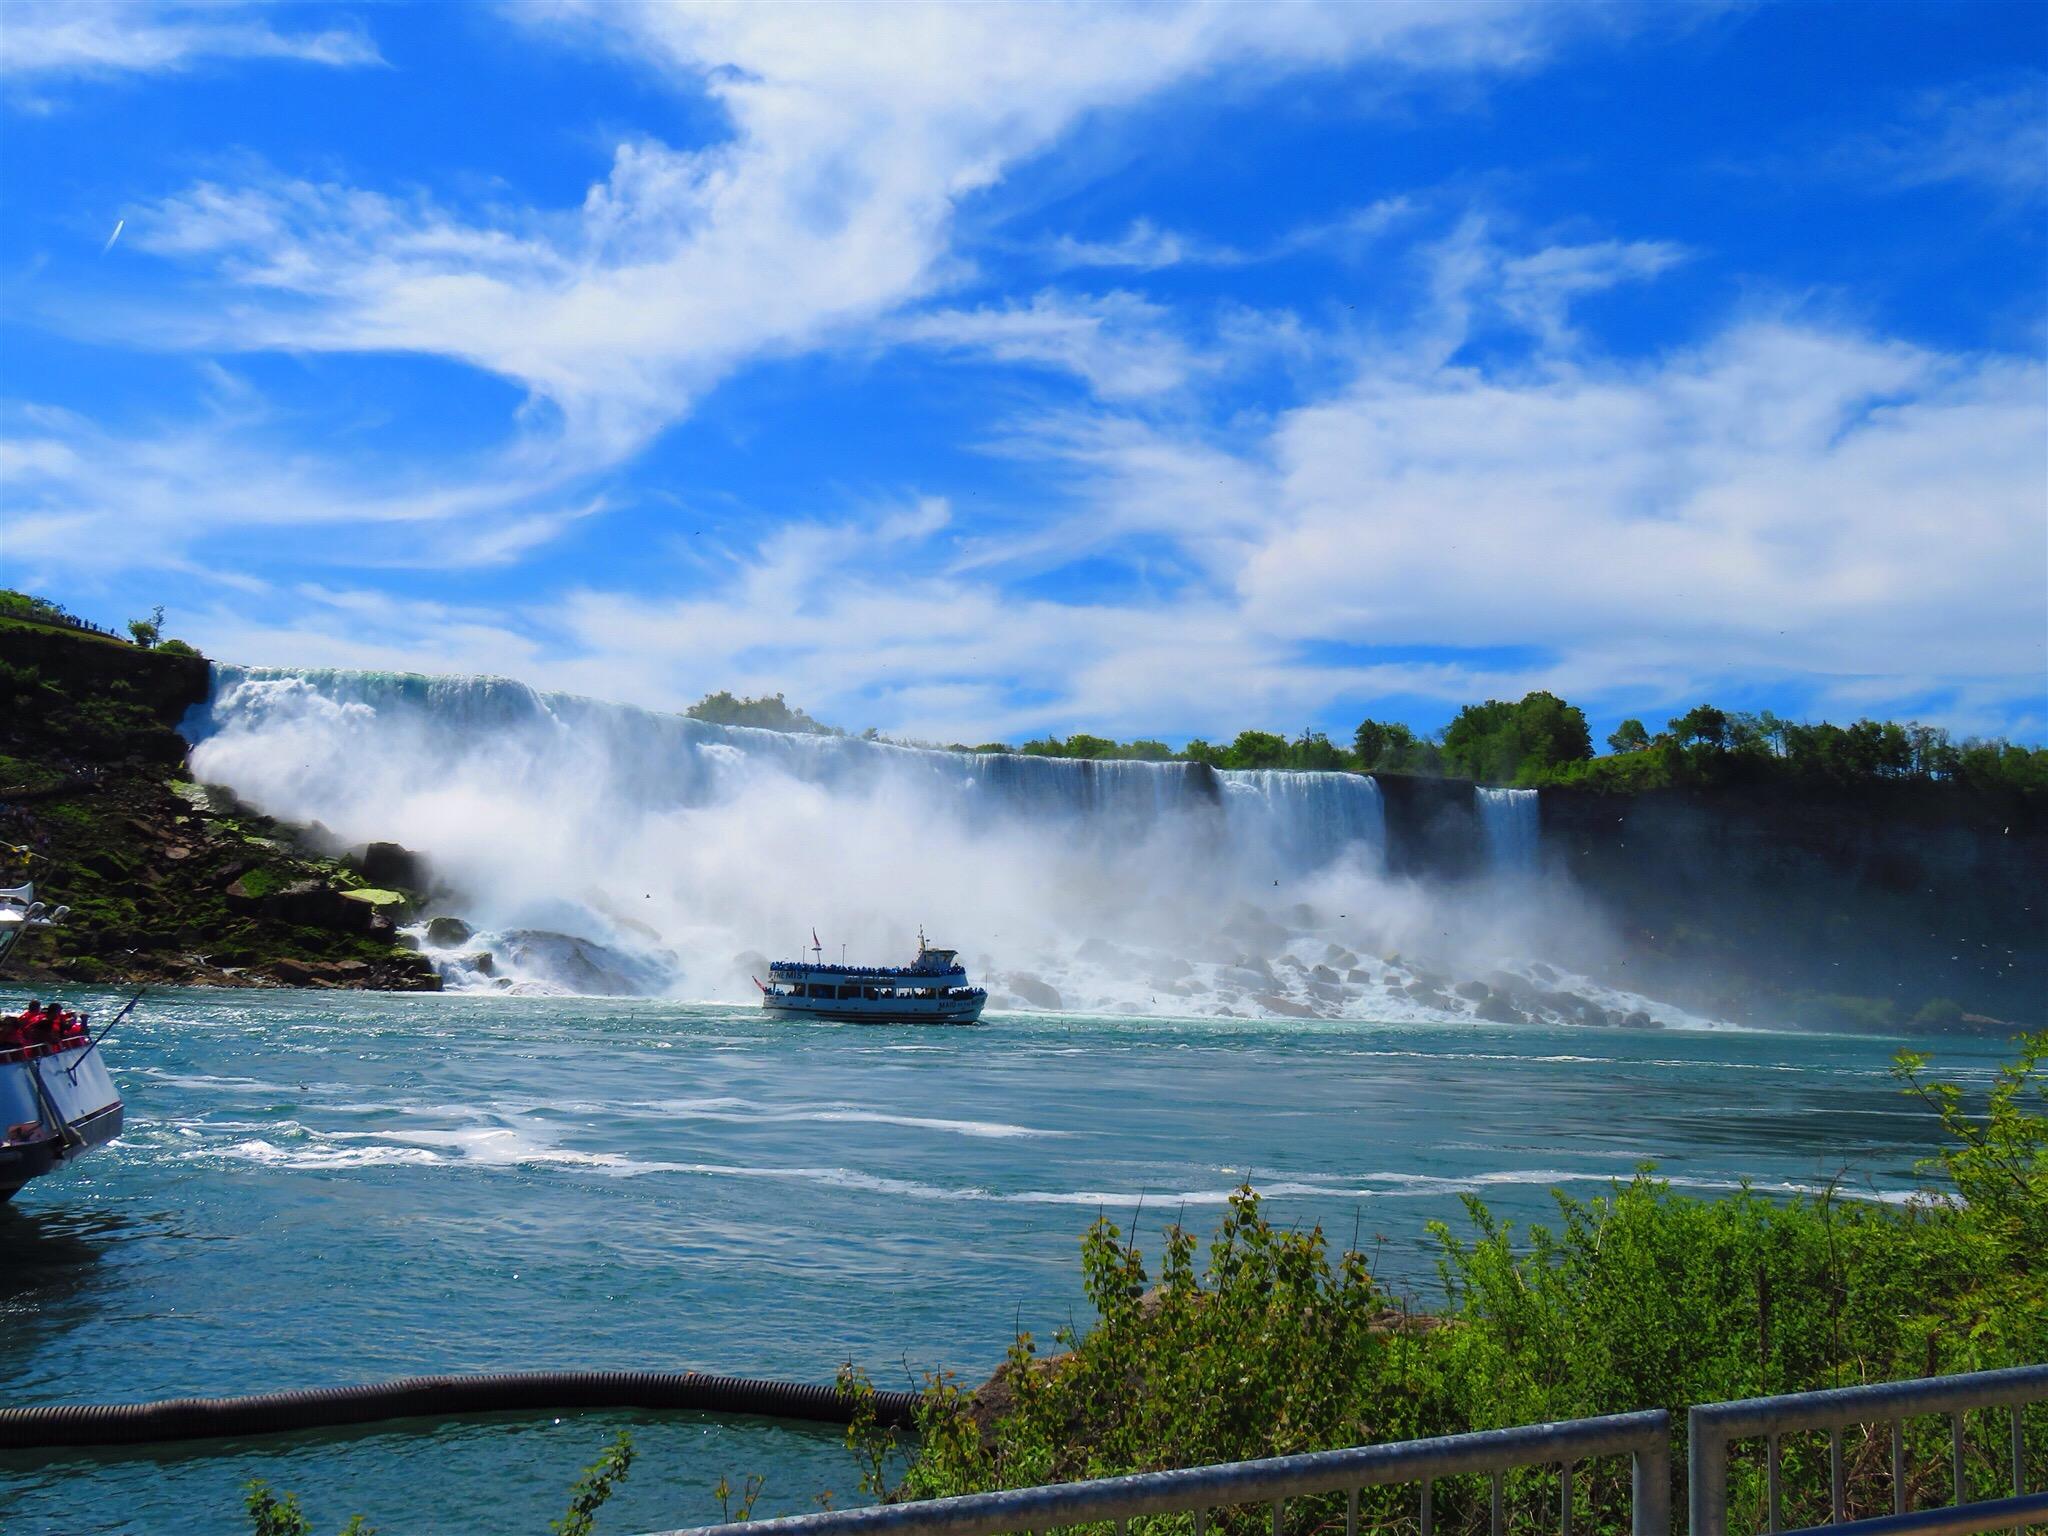 Chute du Niagara - Canada